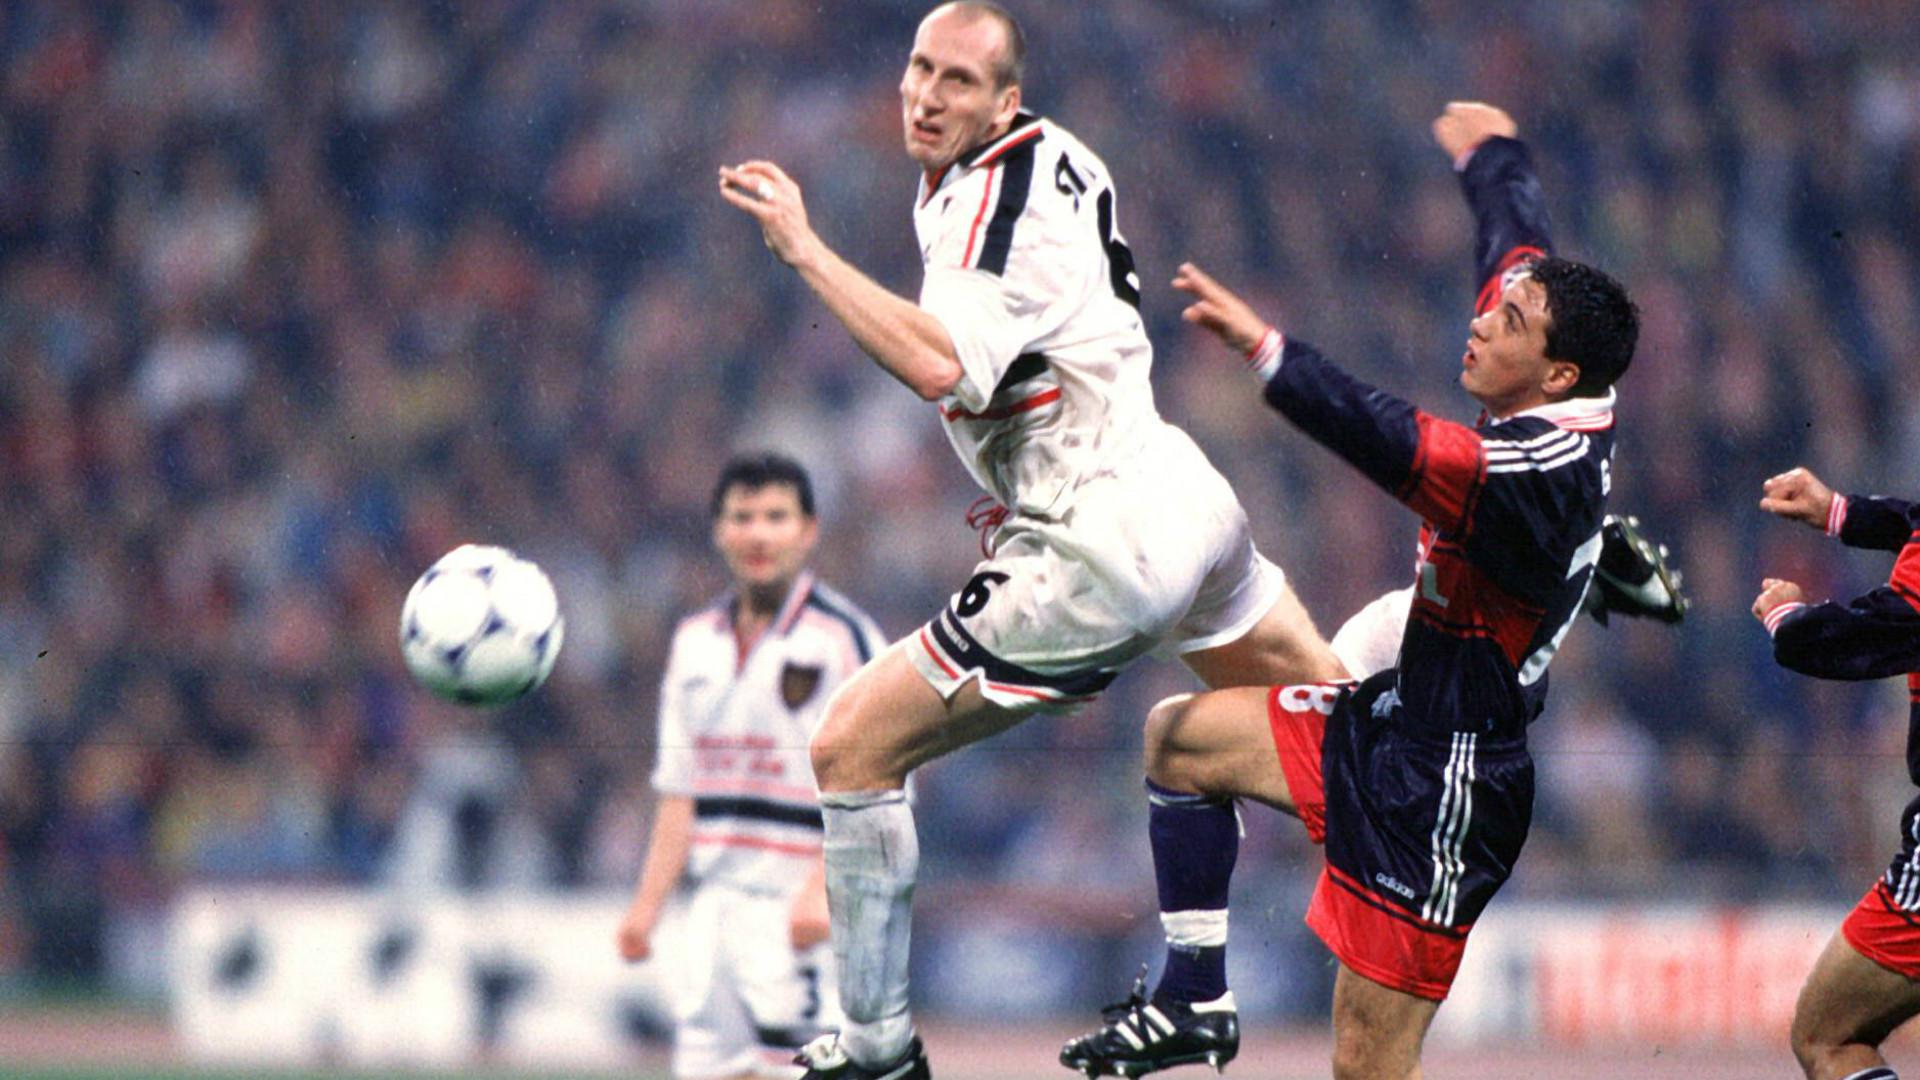 ONLY GERMANY Berkant Göktan Jaap Stam 1998